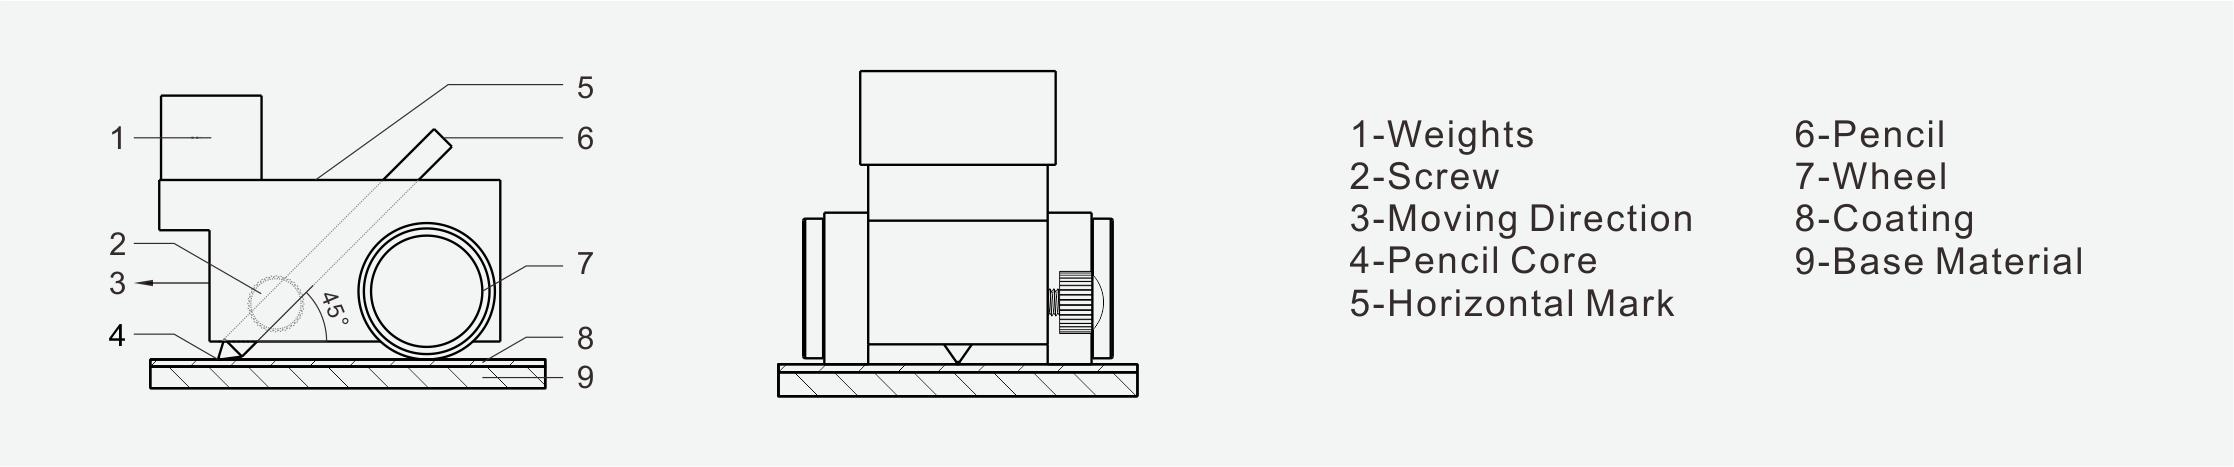 pencil hardness tester rh 120p portable coating hardness meter for